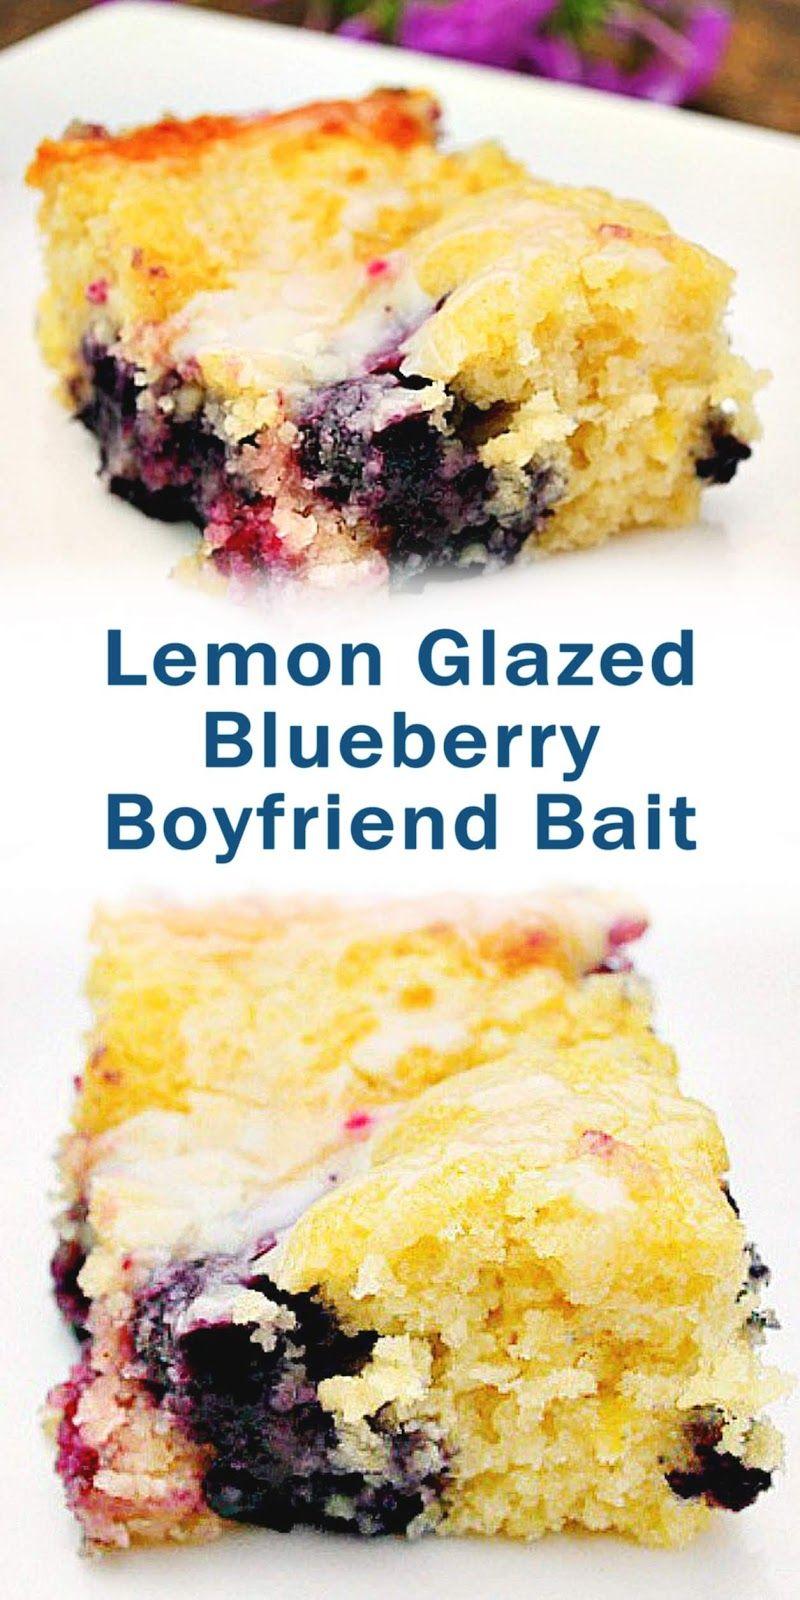 Lemon Glazed Blueberry Boyfriend Bait Bestrecipe005 Resep Makanan Penutup Resep Makanan Makanan Enak